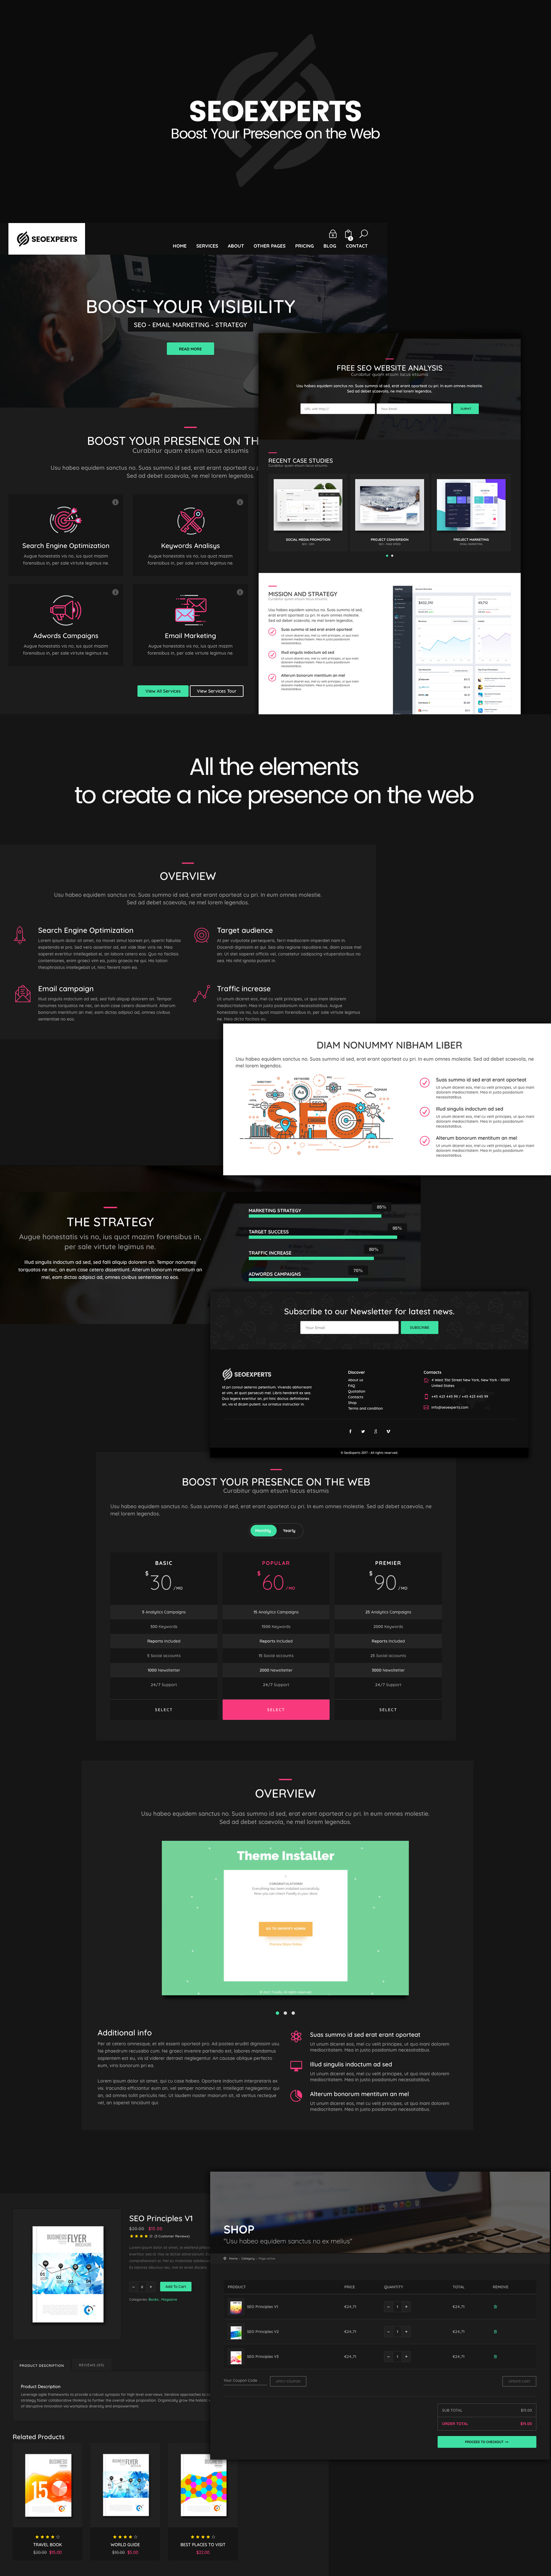 digital marketing Email marketing   google agency online marketing search engine optimization SEM SEO